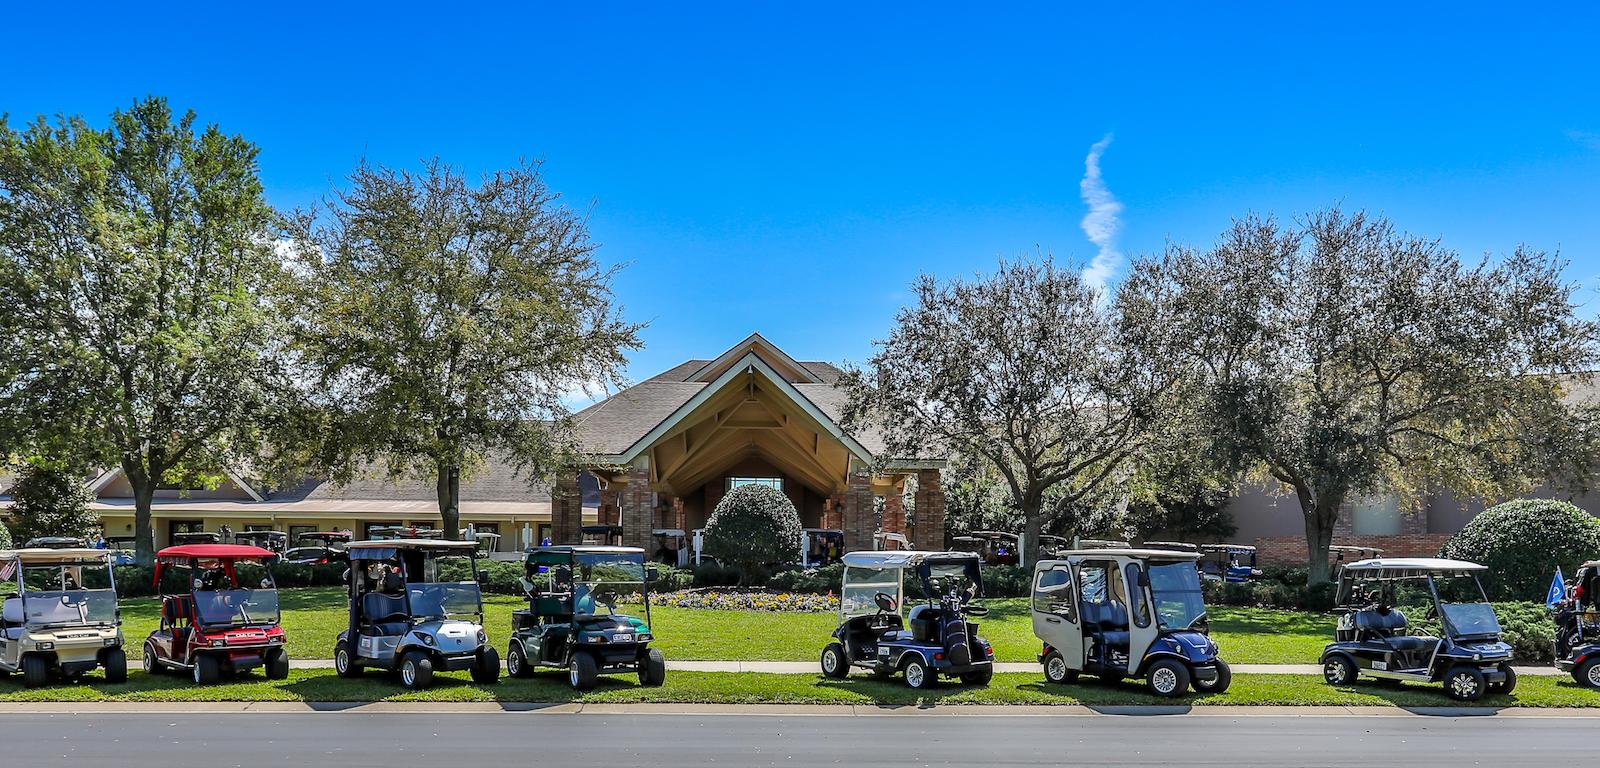 Golfing - Golf carts